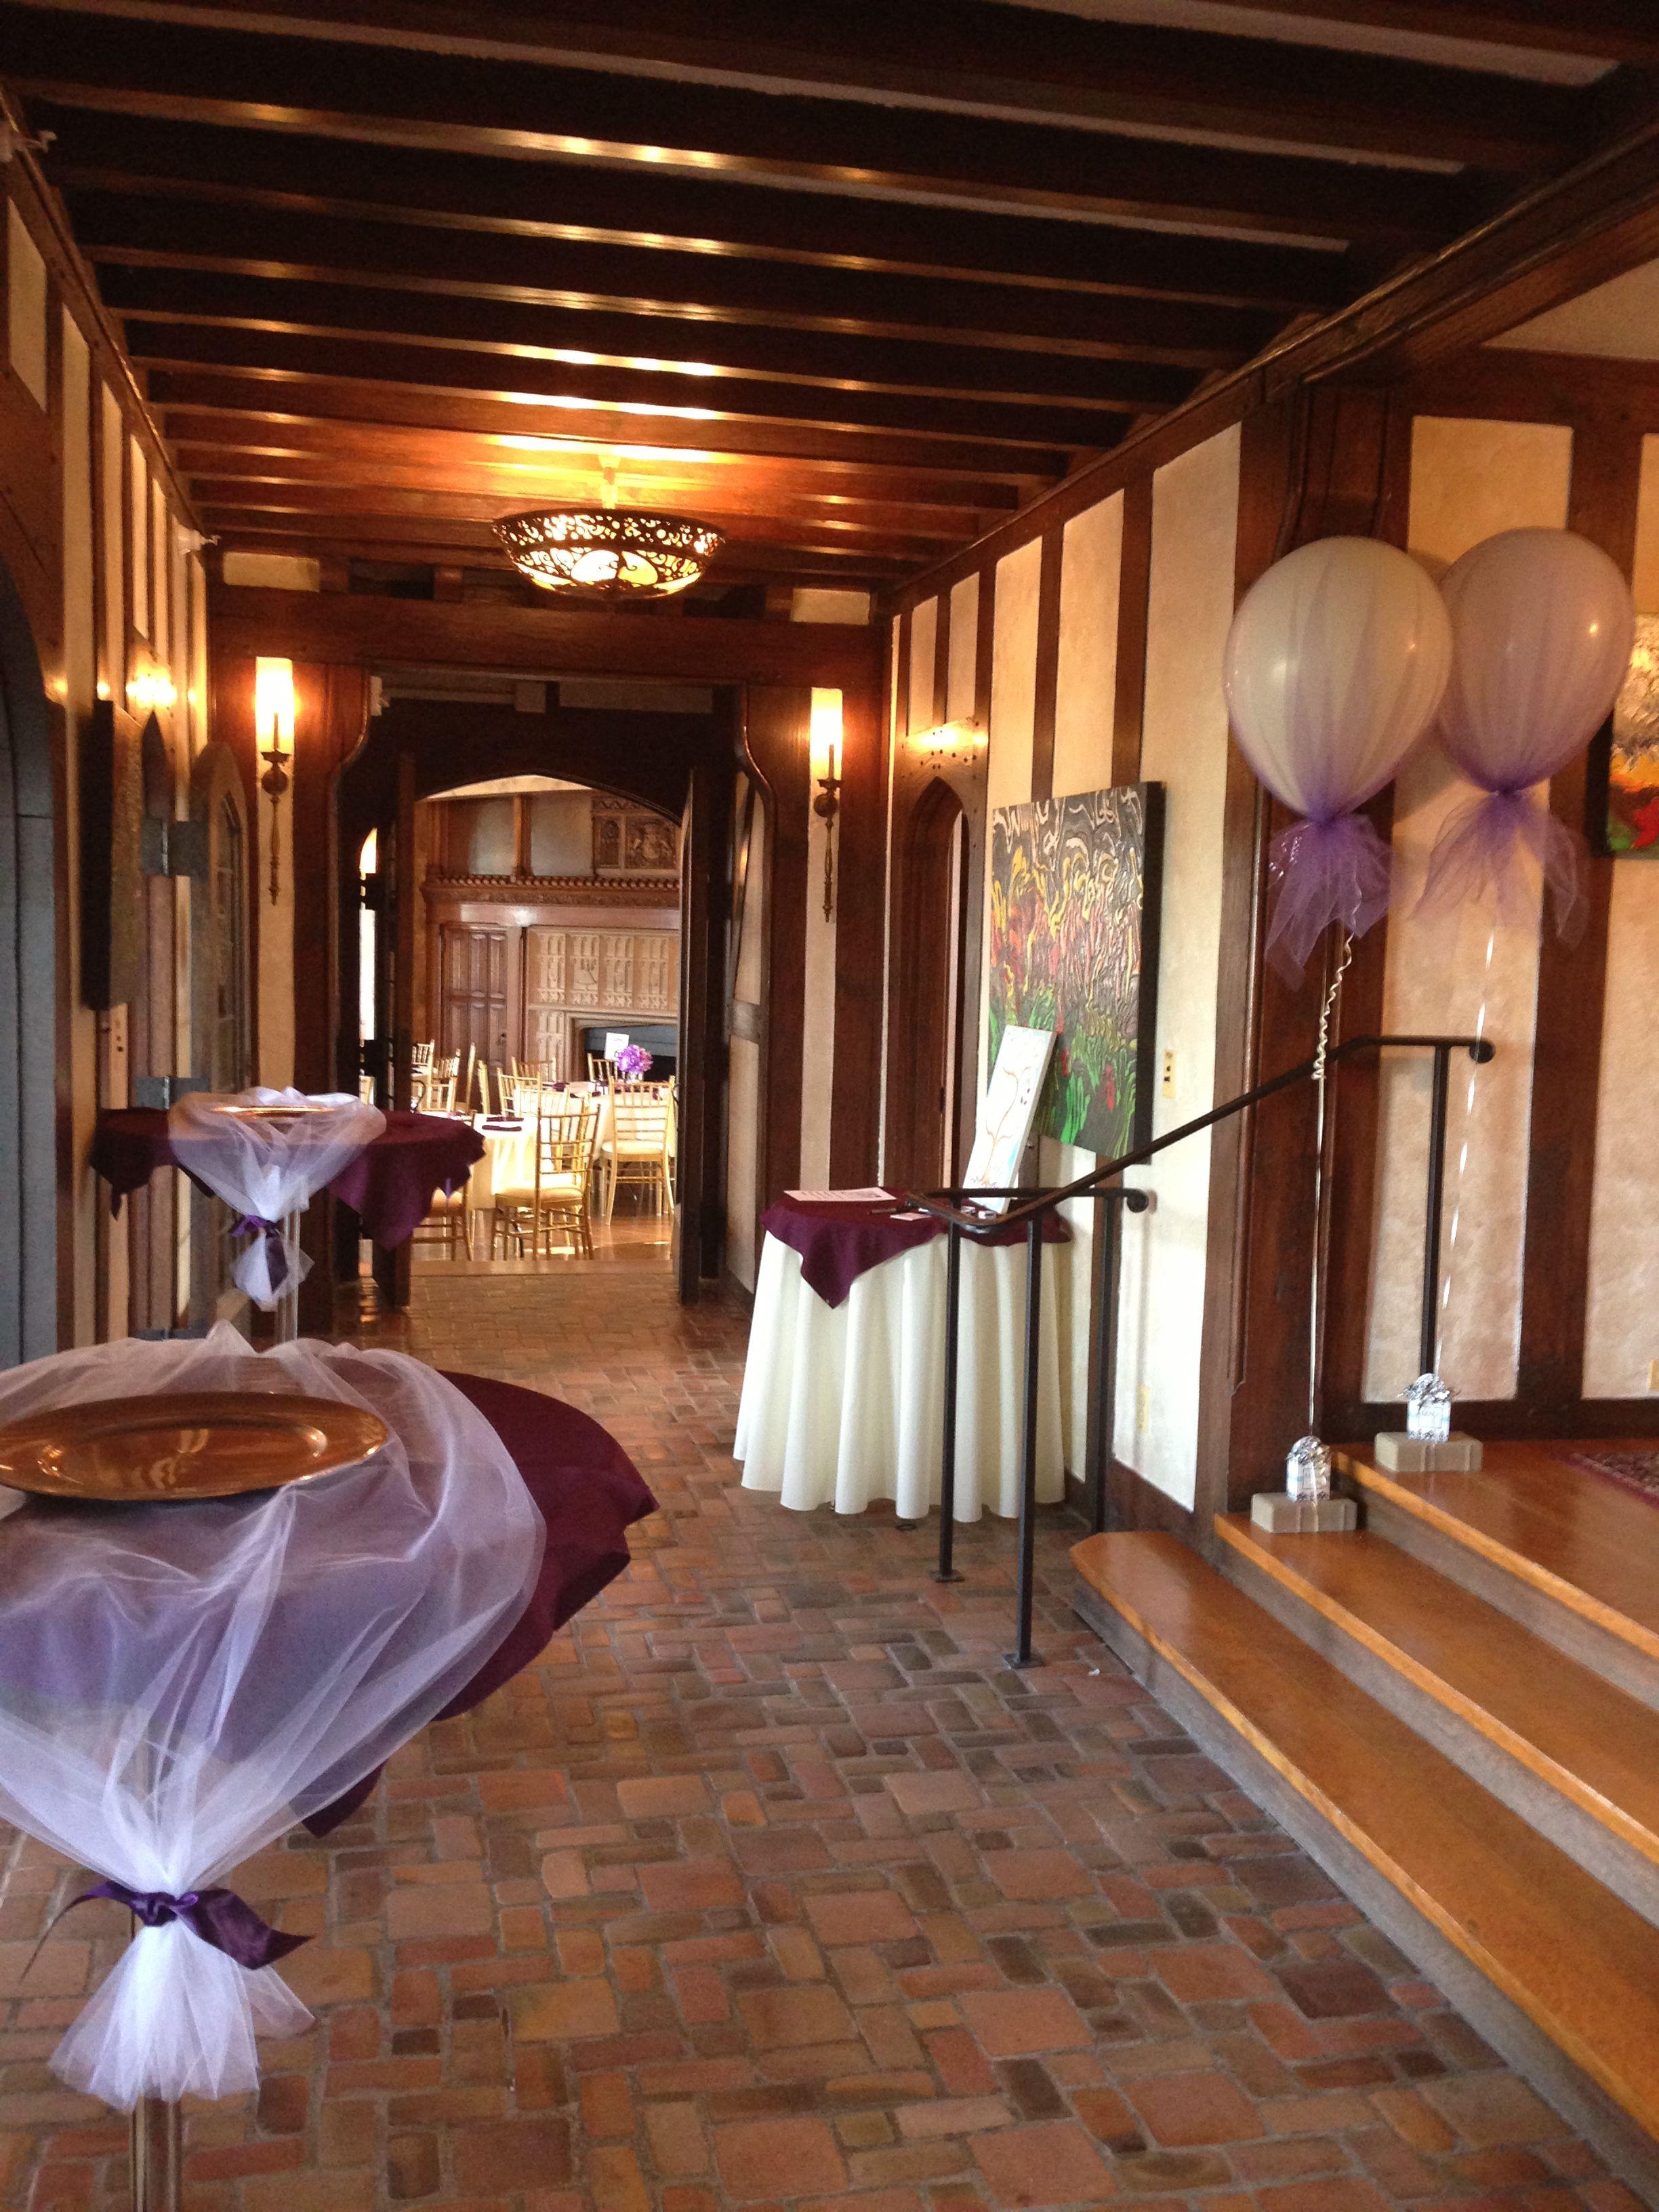 Gallery Courthouse wedding, Dream wedding, Wedding